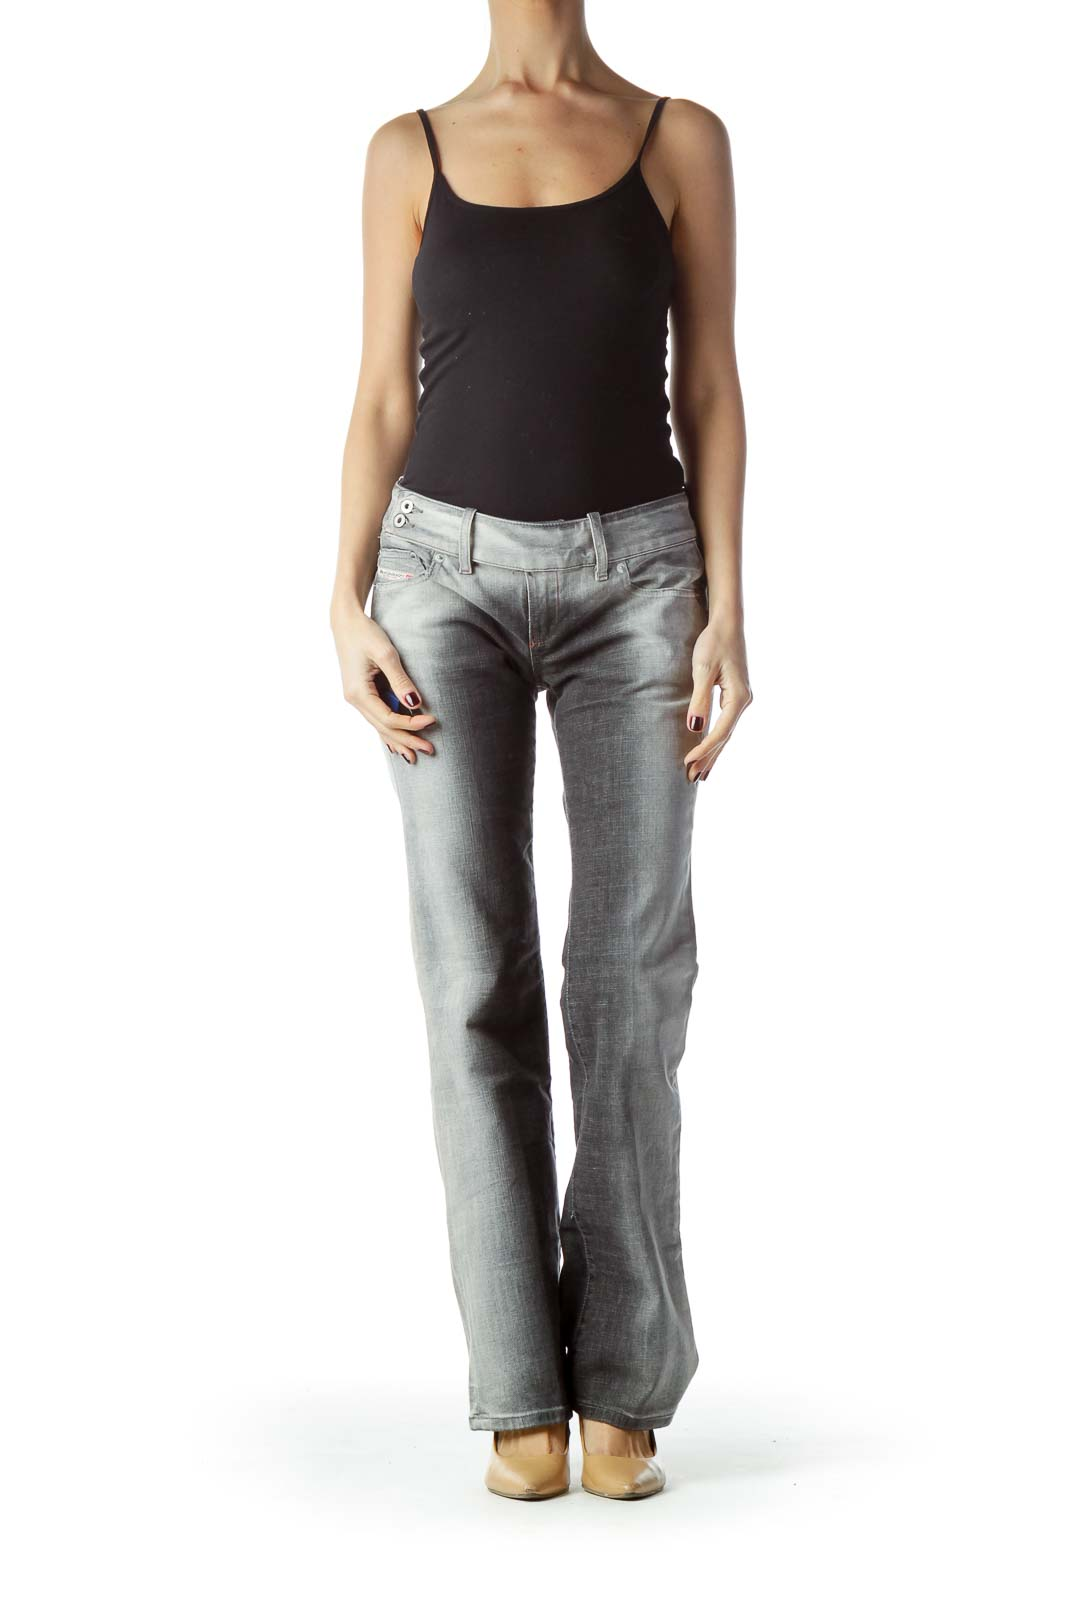 Two-Tone Gray Denim Jeans